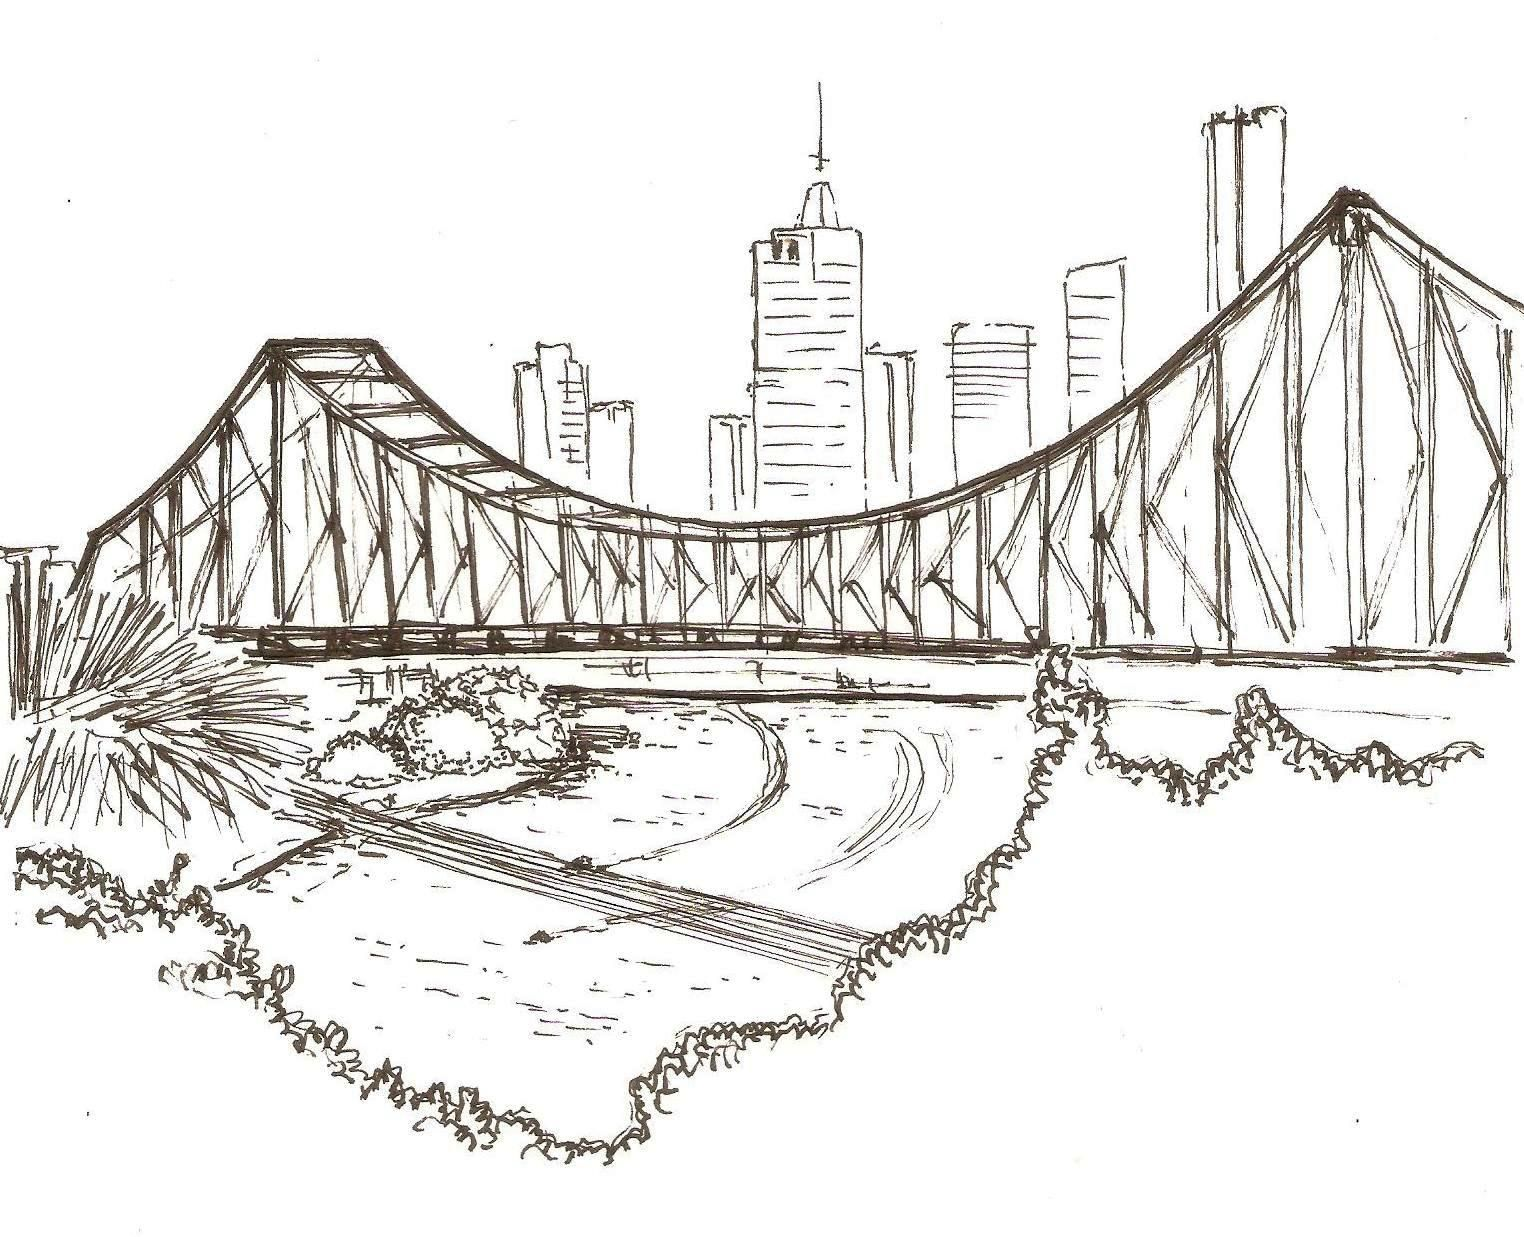 Architectural Drawings Of Bridges story bridge | sketch | pinterest | bridge and sketches